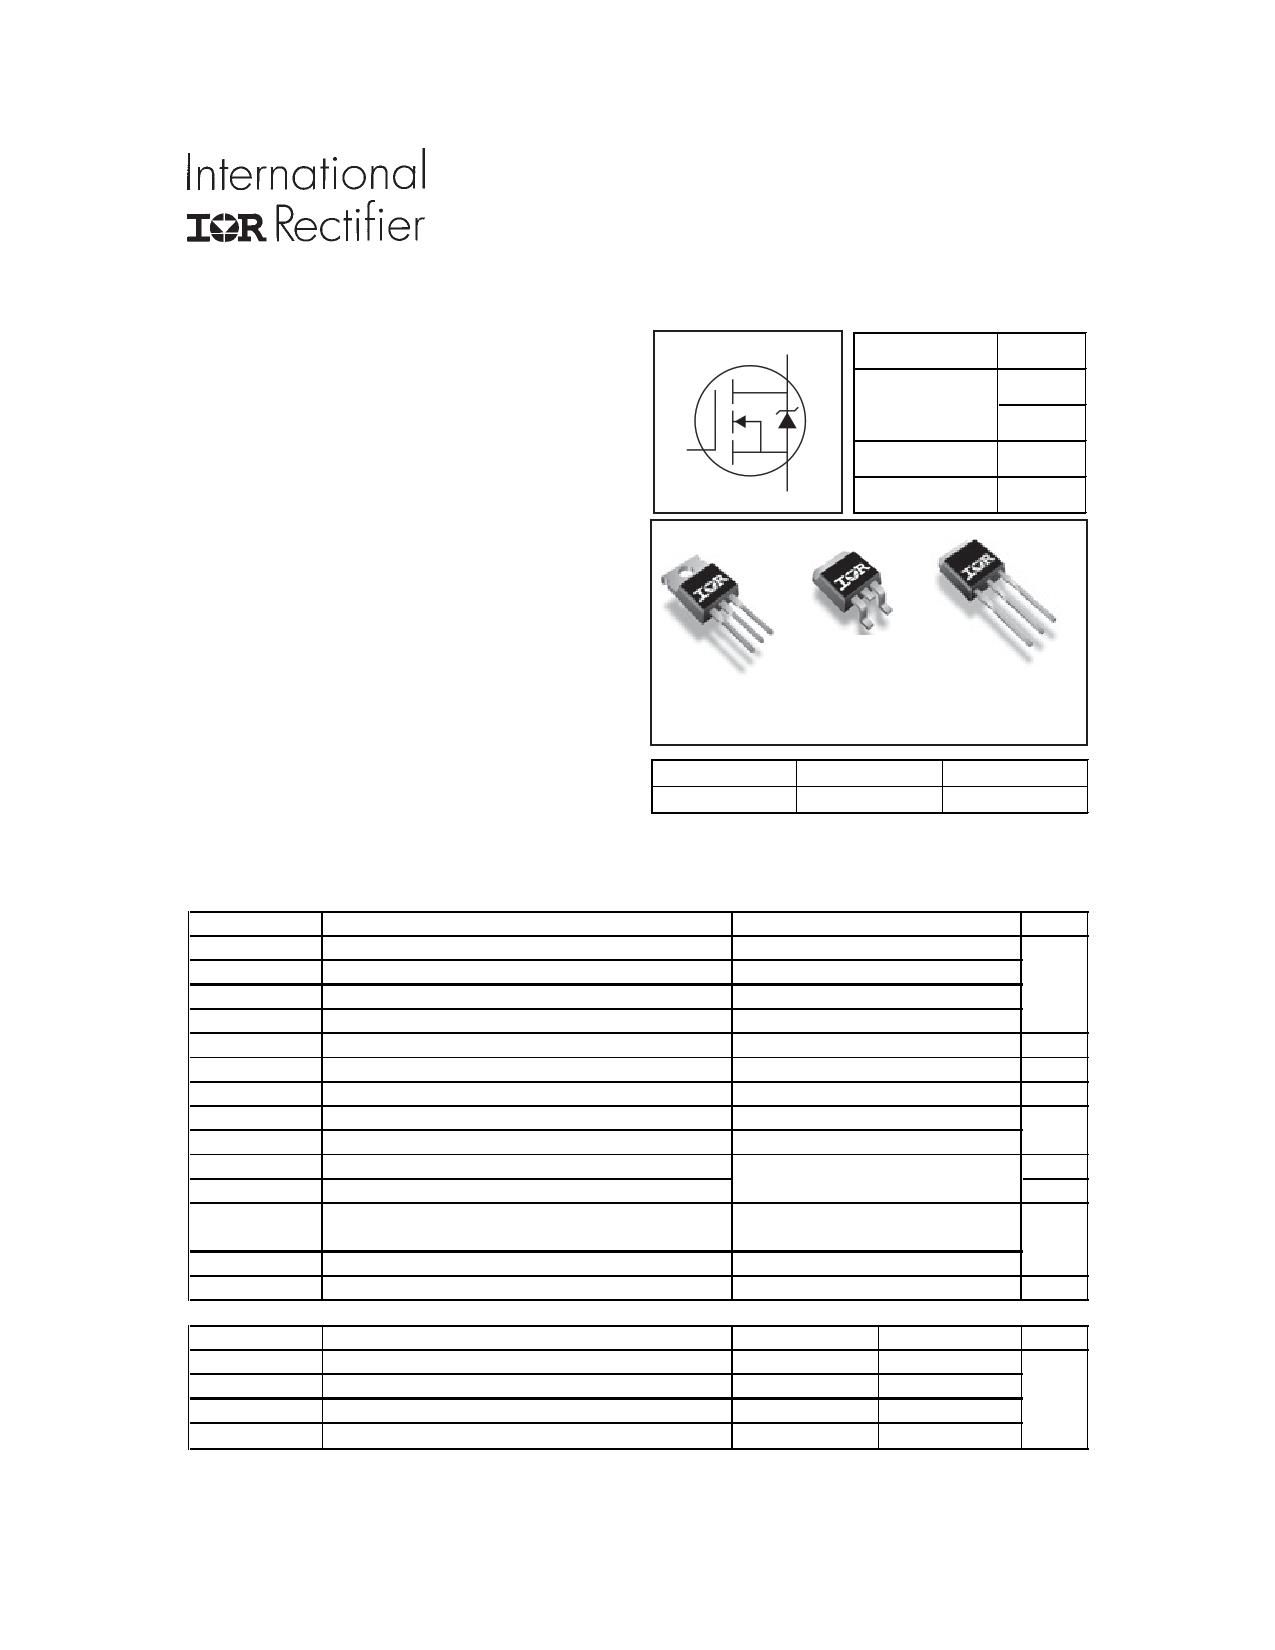 AUIRL1404Z datasheet, circuit